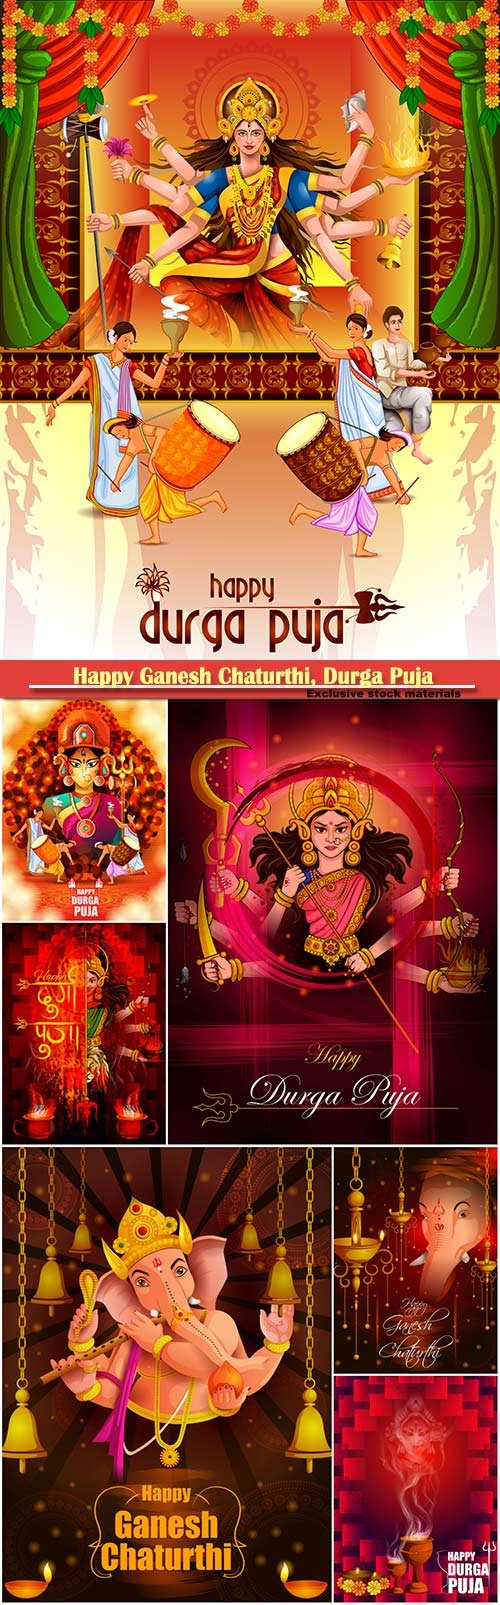 Happy Ganesh Chaturthi, Durga Puja vector illustration